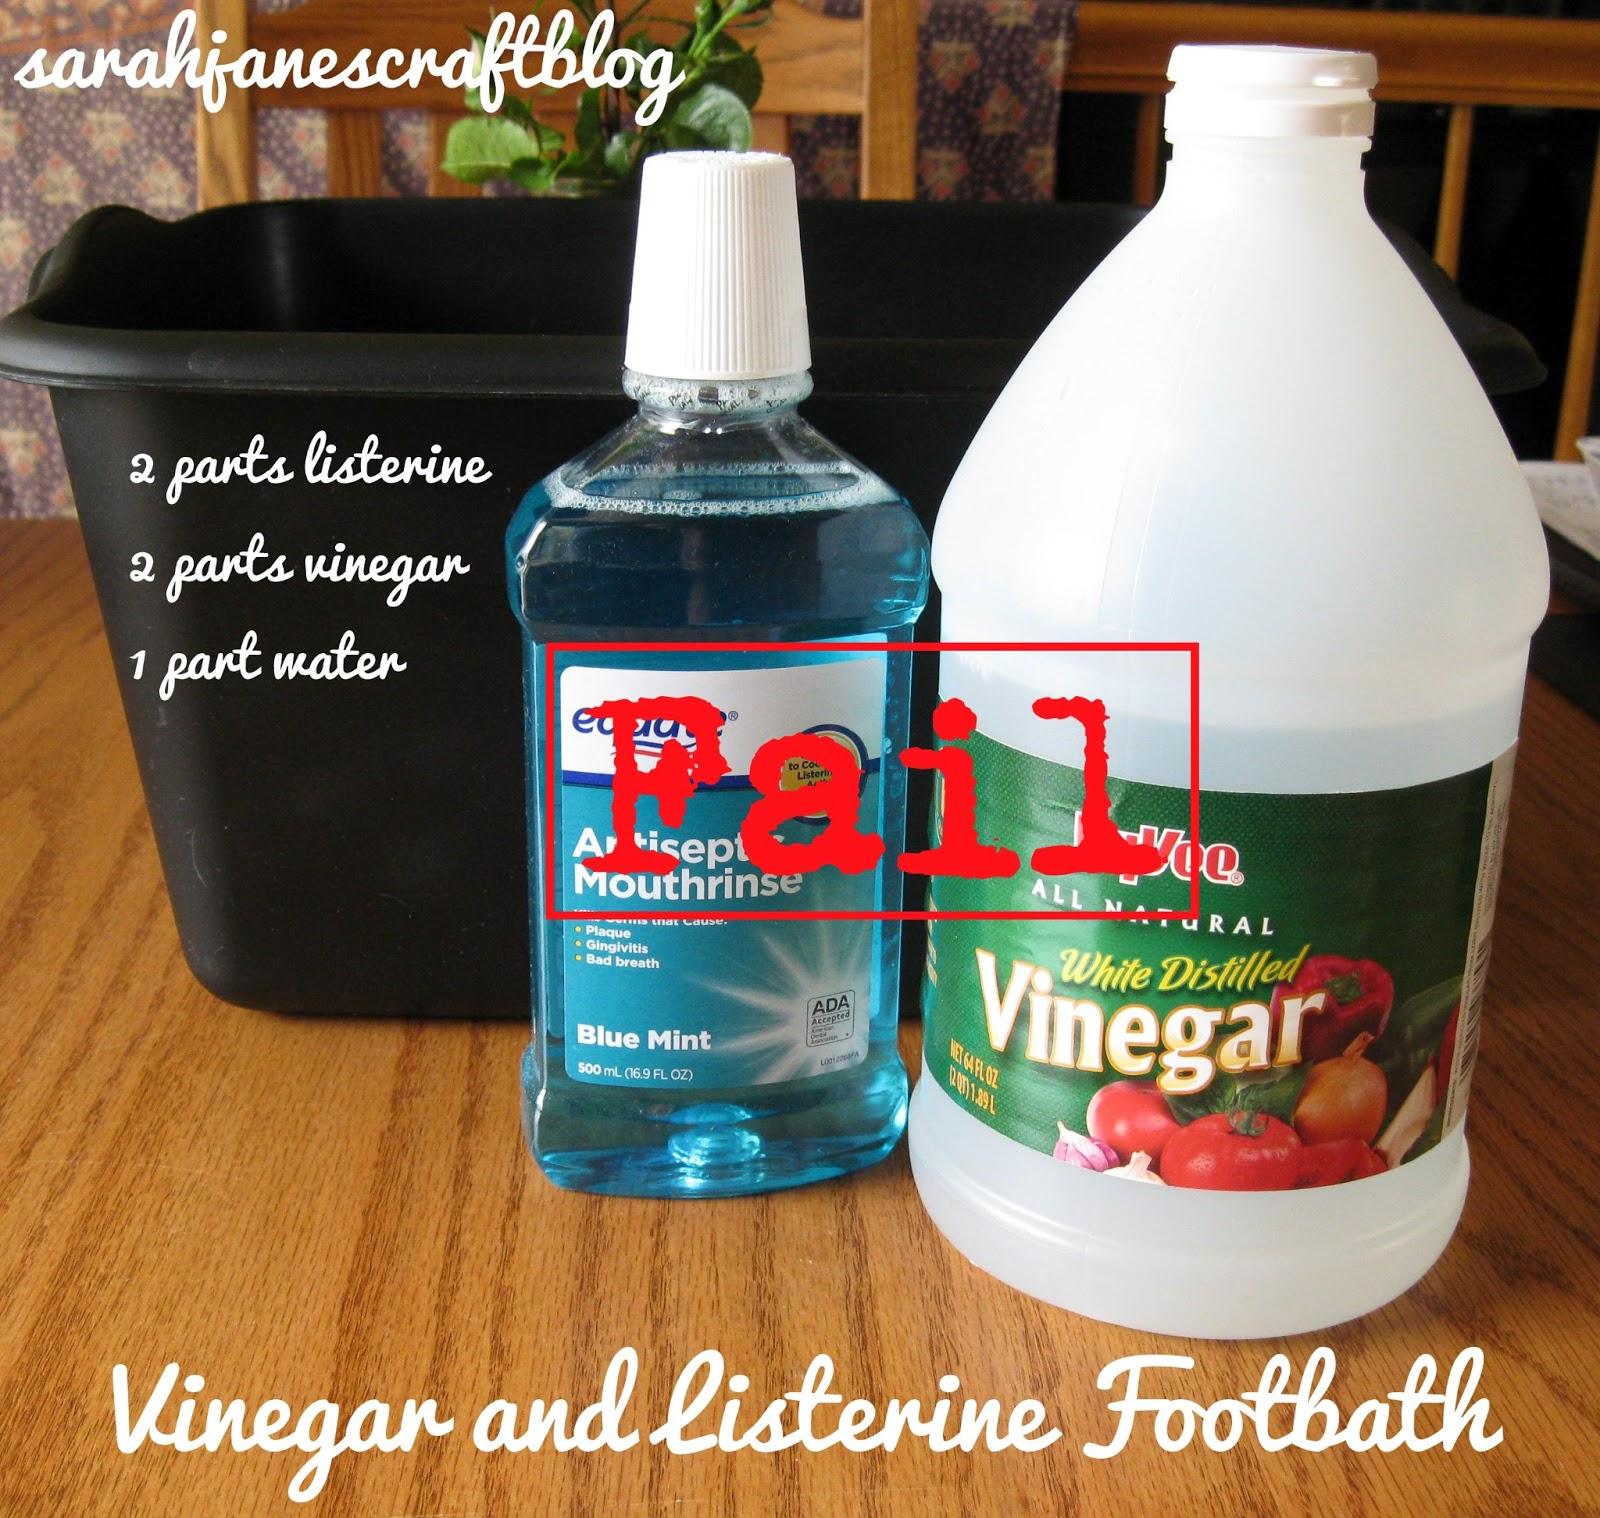 Sarah Jane S Craft Blog As Seen On Pinterest Vinegar And